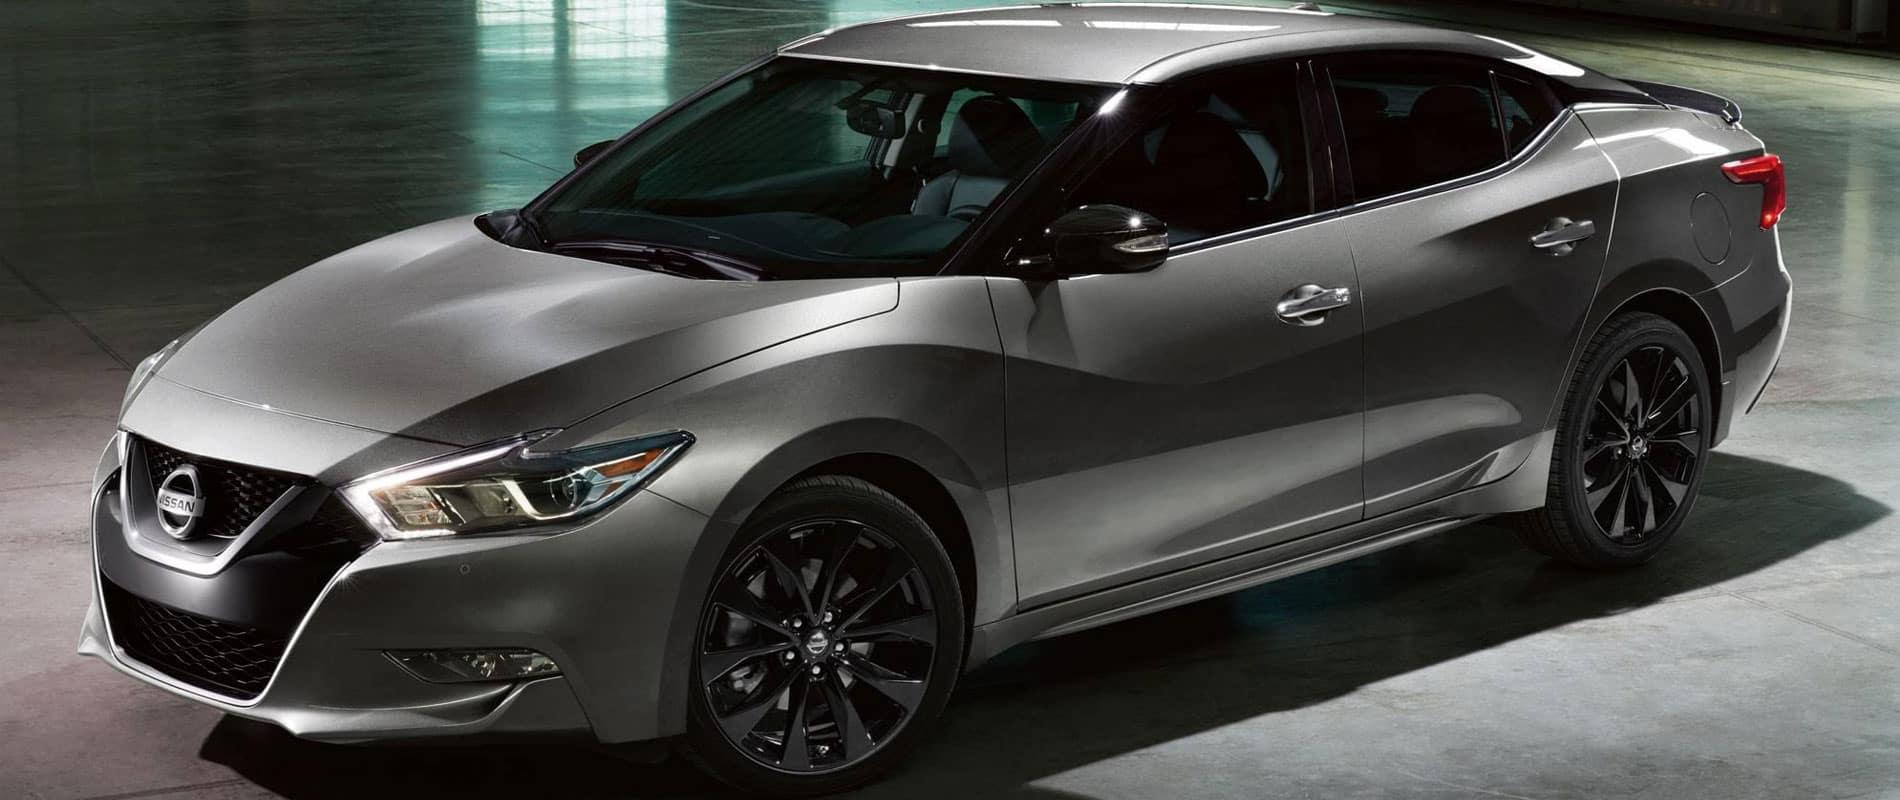 2018 Nissan Maxima Trims at Star Nissan